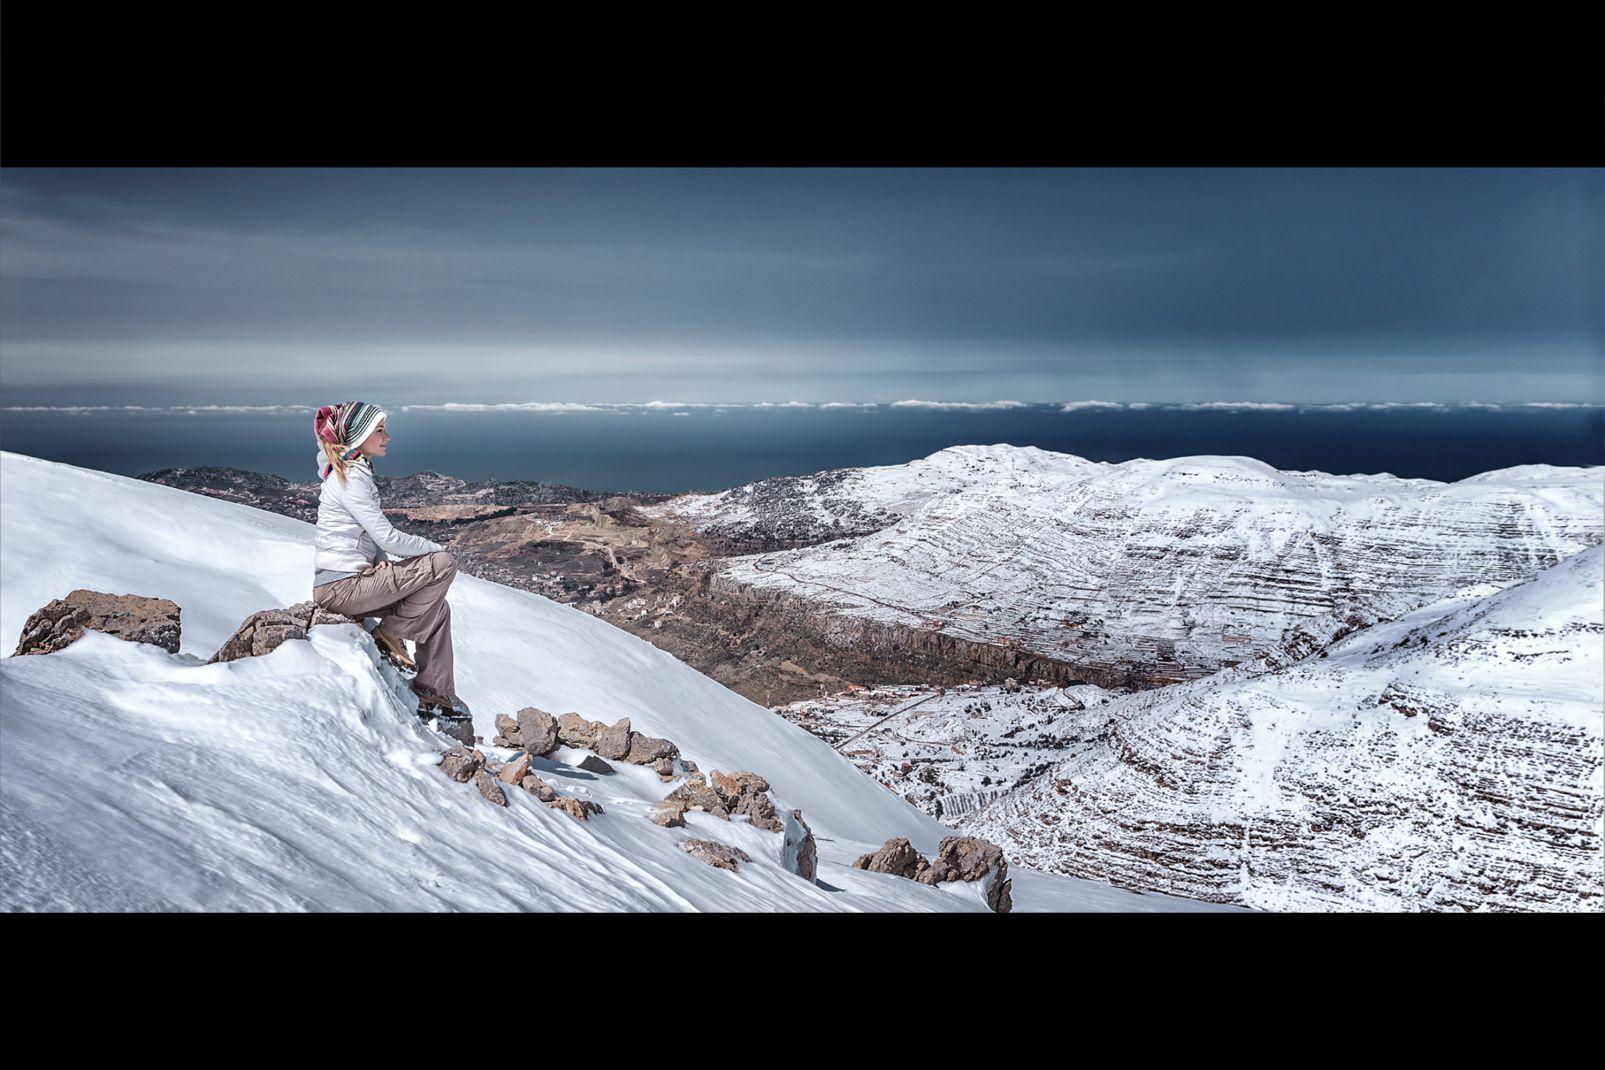 Liban, moyen-orient, méditerranée, montagne, femme, neige